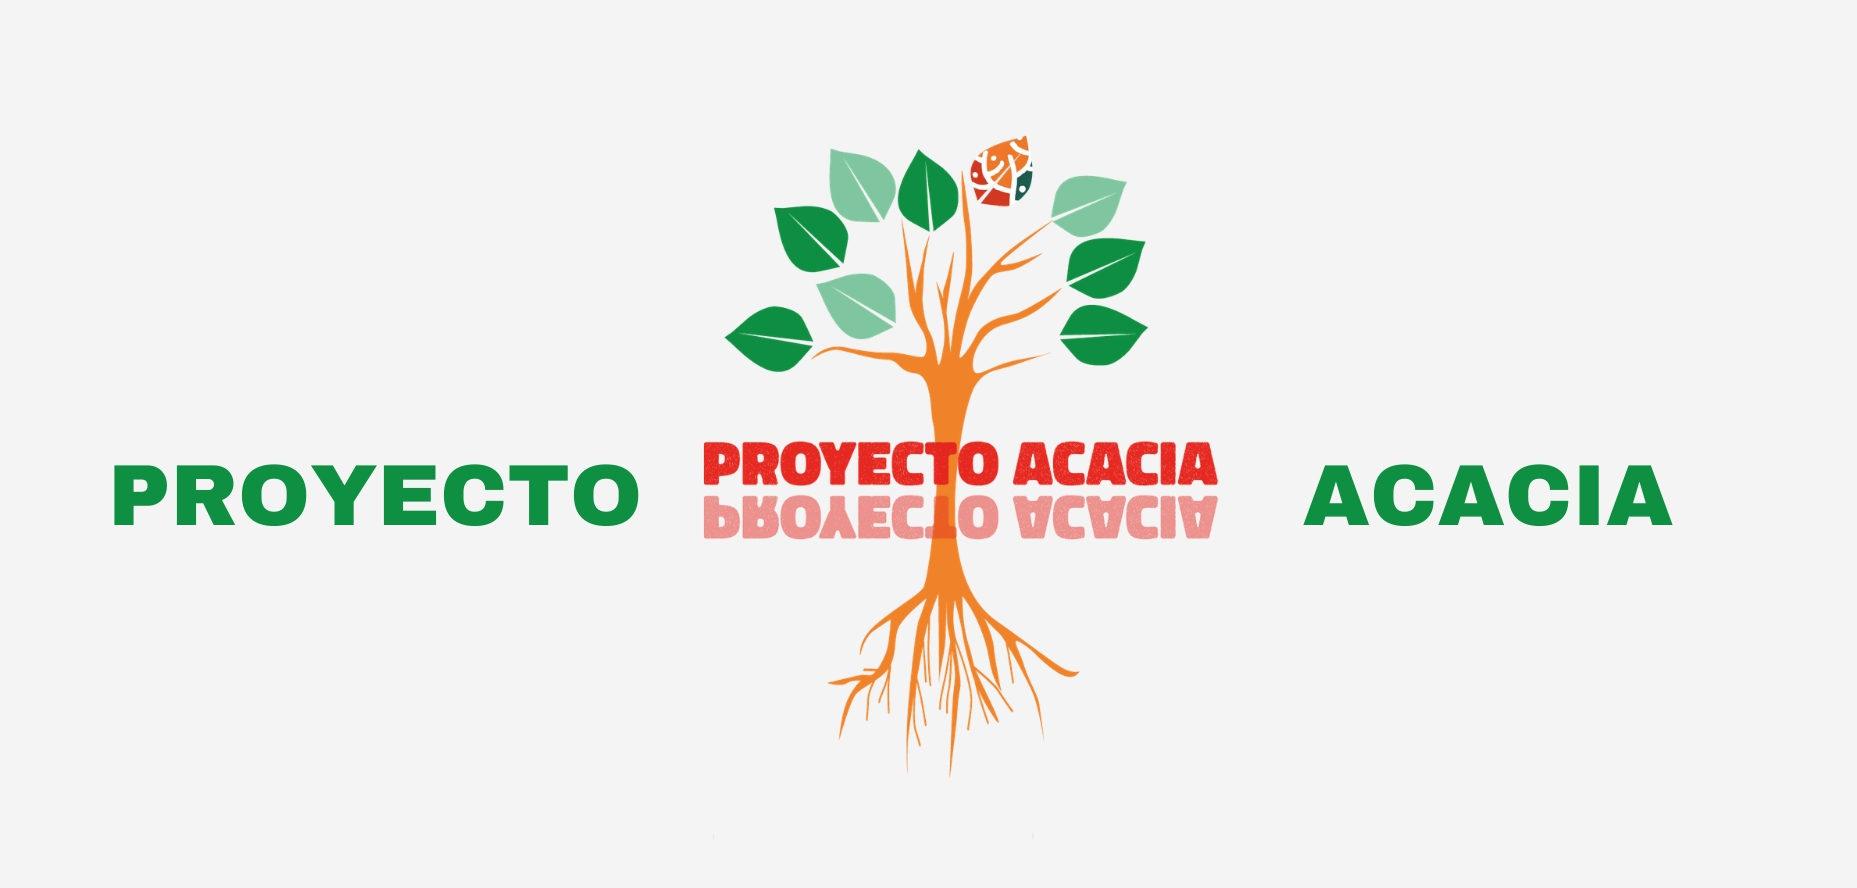 Proyecto ACACIA salud mental mujer rural